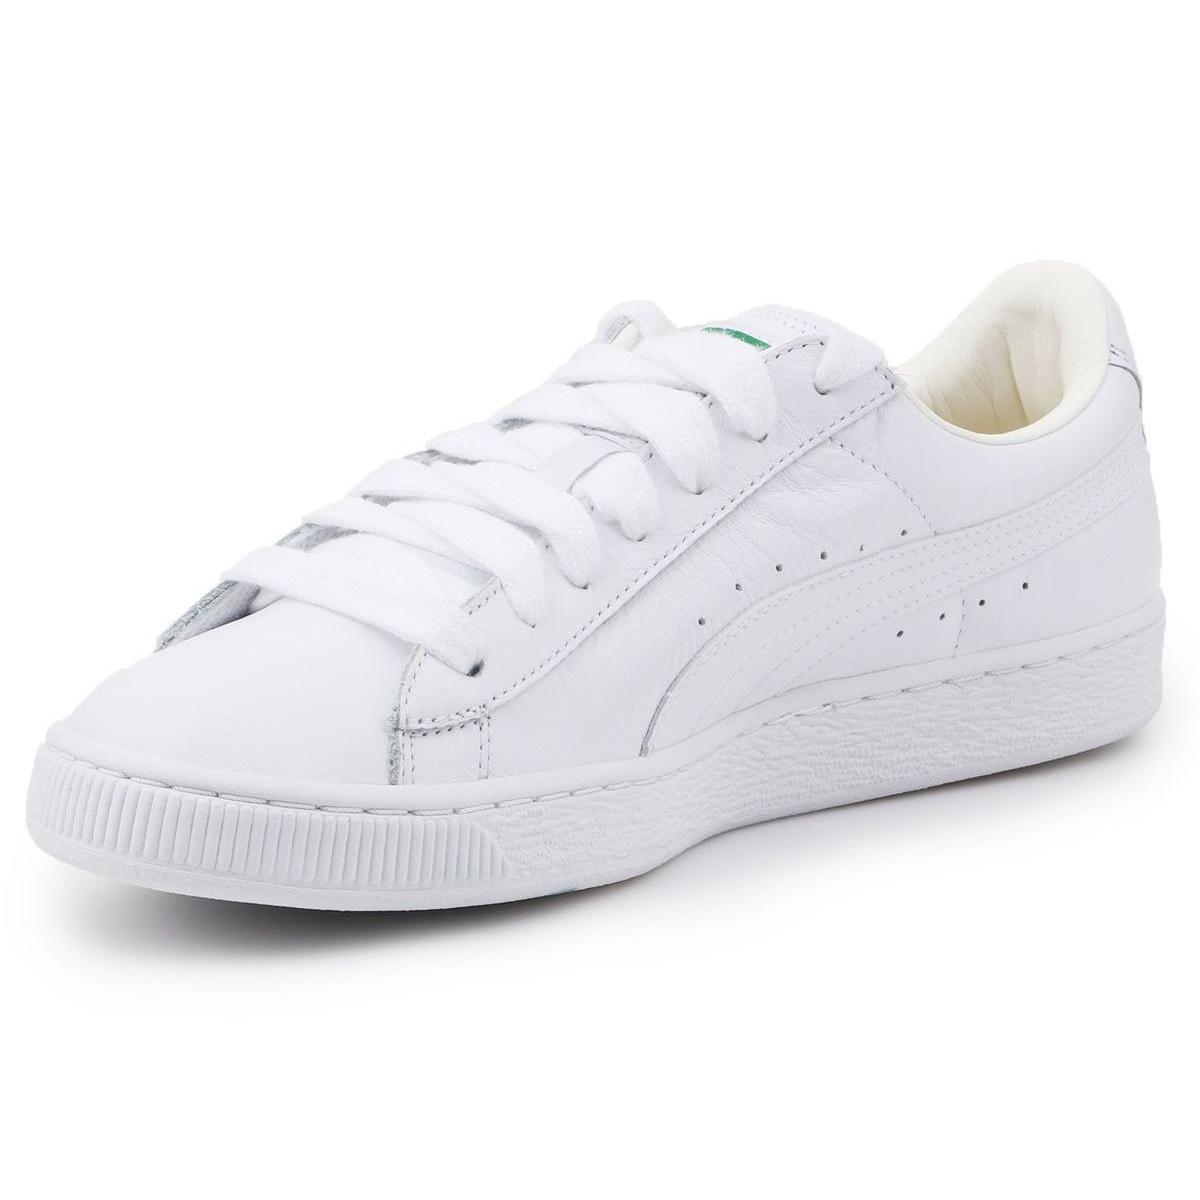 Puma Basket Classic Lfs M 354367 17 shoes white